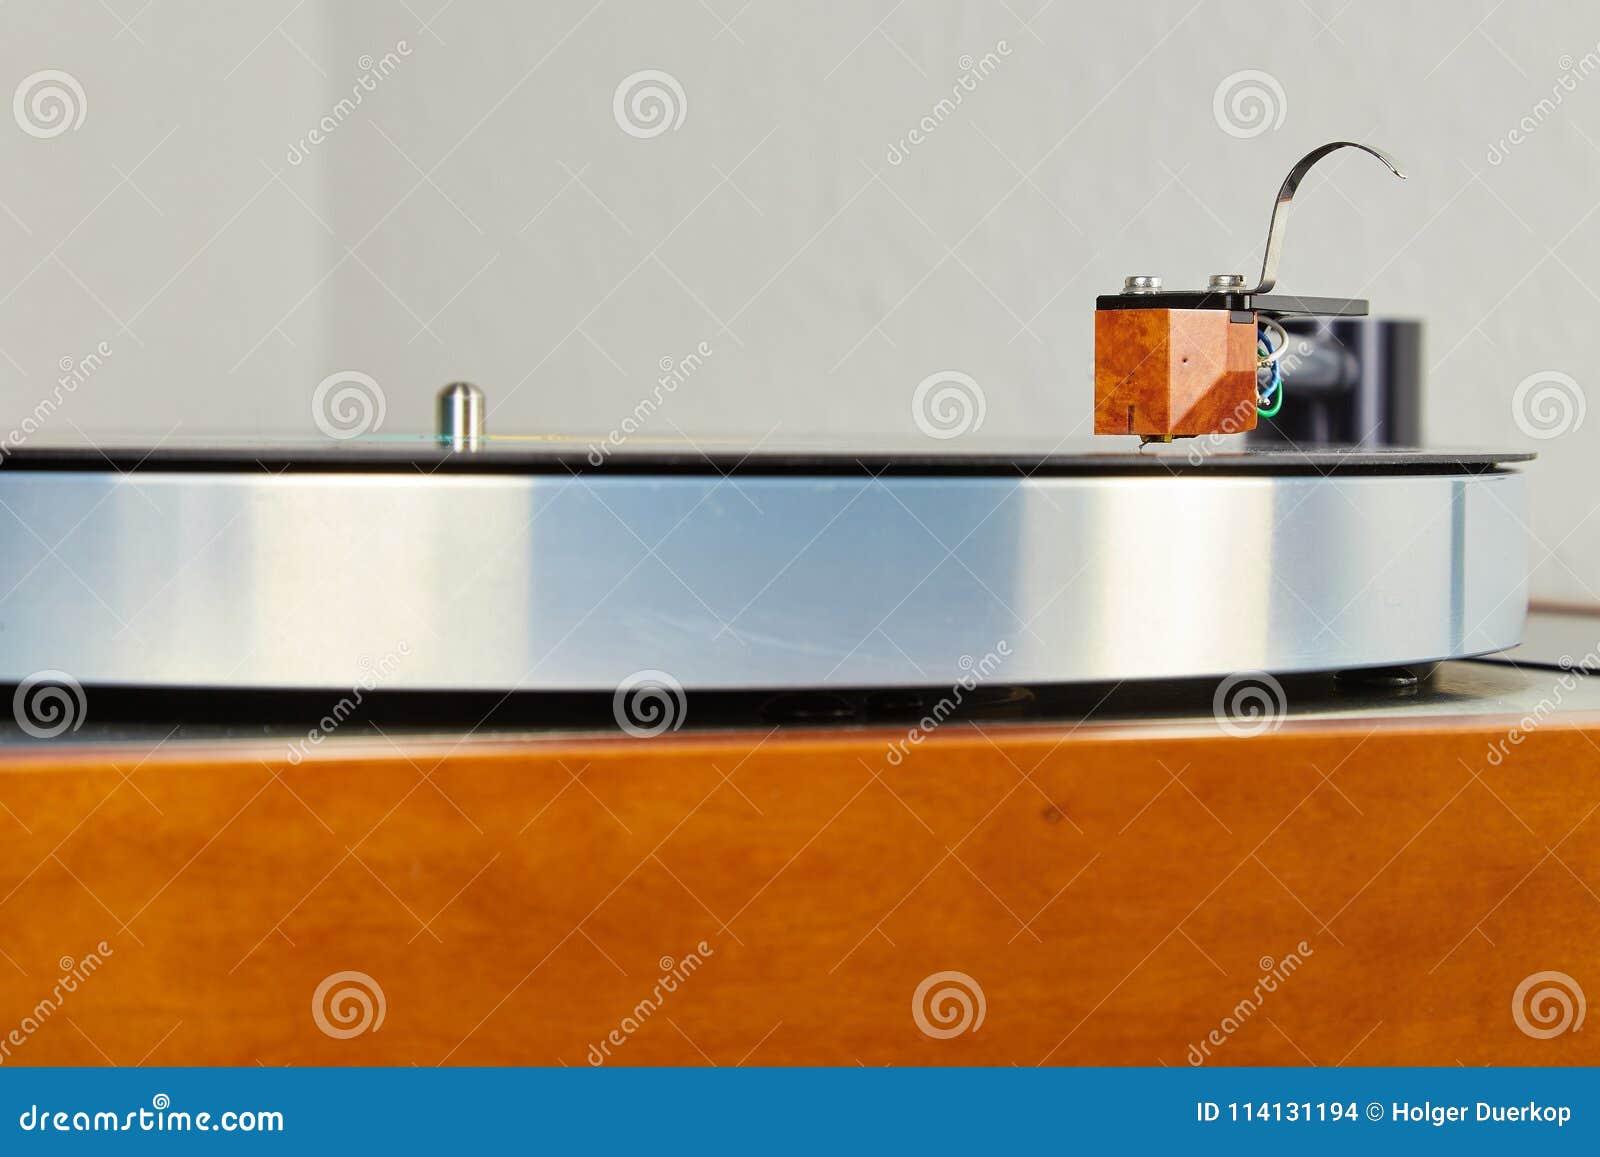 Turntable On A Nice Simple Shelf Stock Photo - Image of